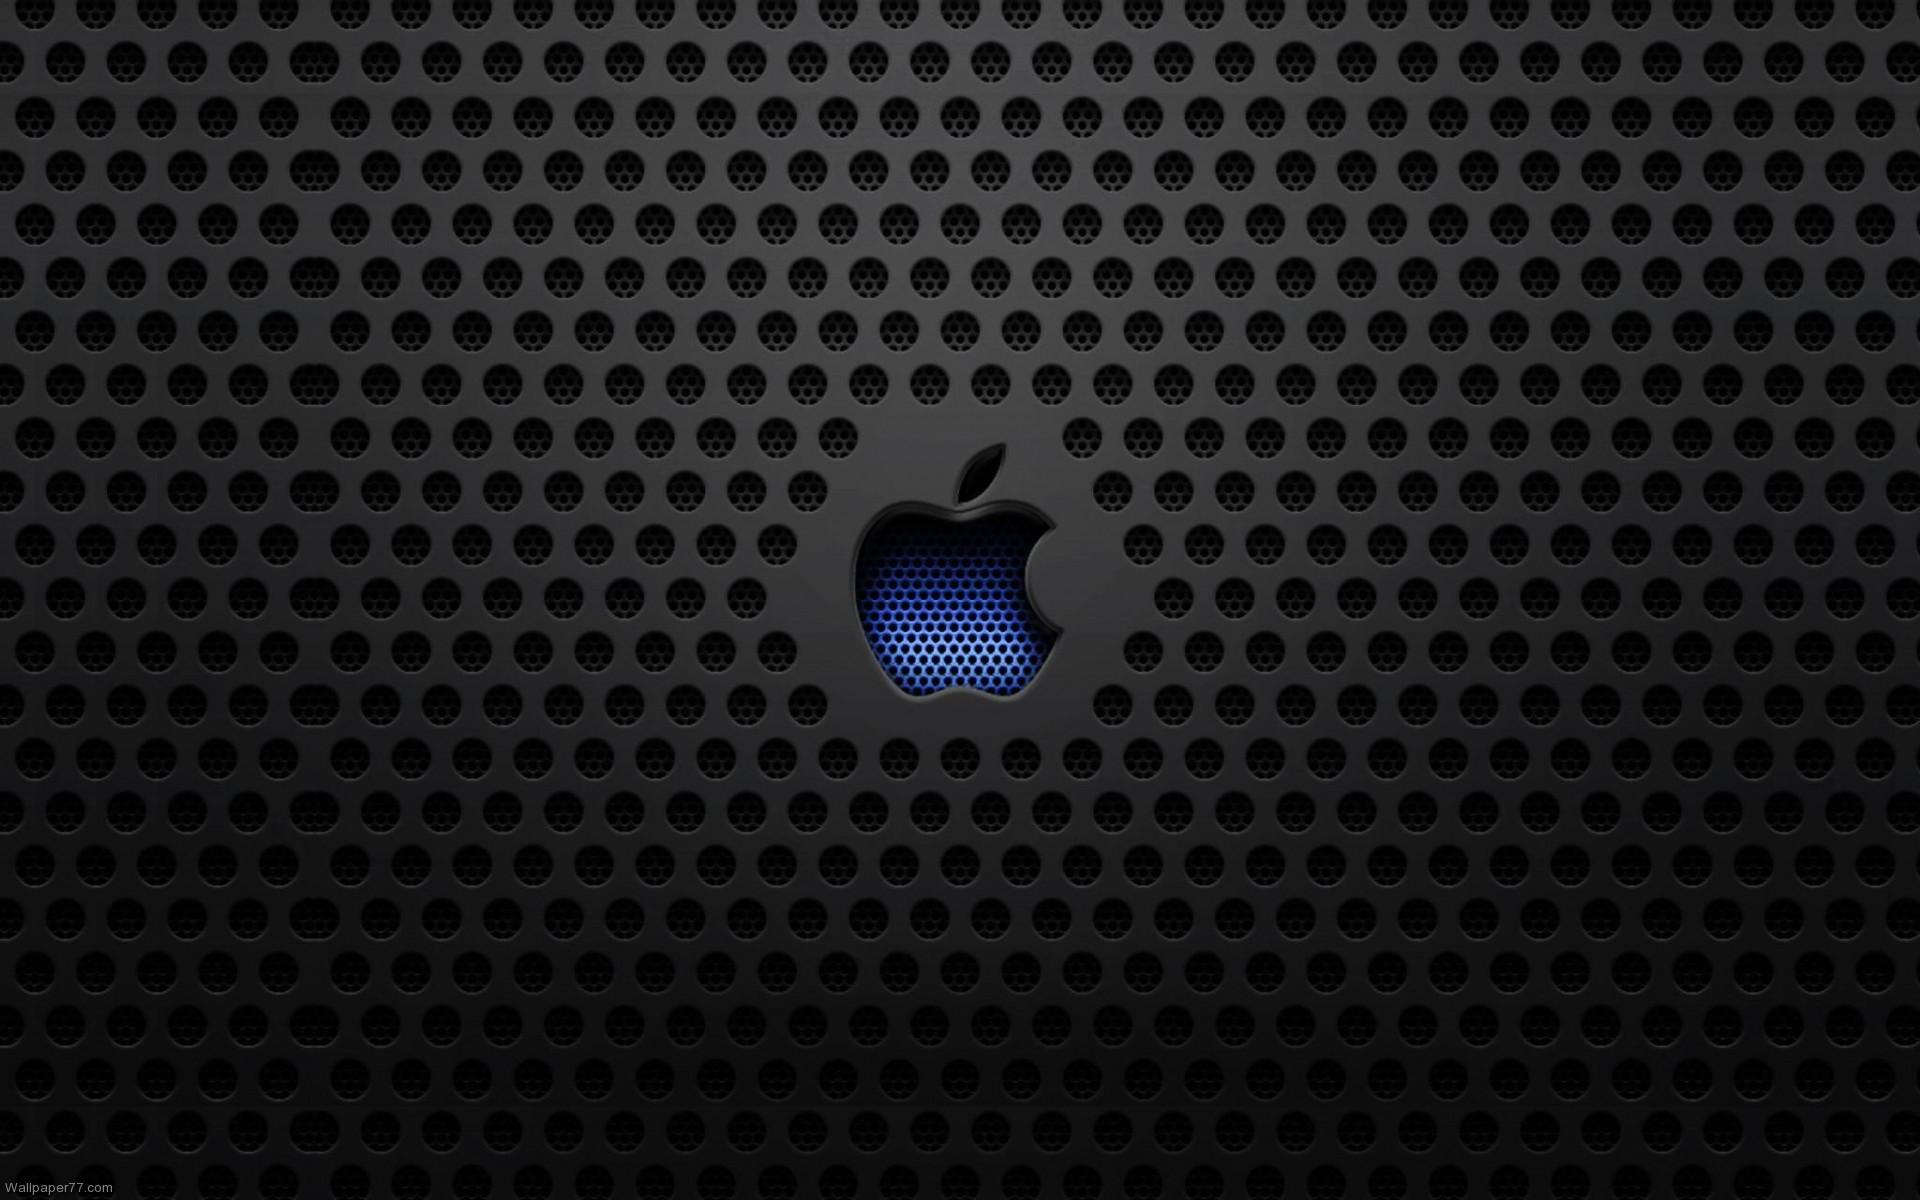 Apple Logo ipad 3 wallpaper ipad wallpaper retina display wallpaper 1920x1200